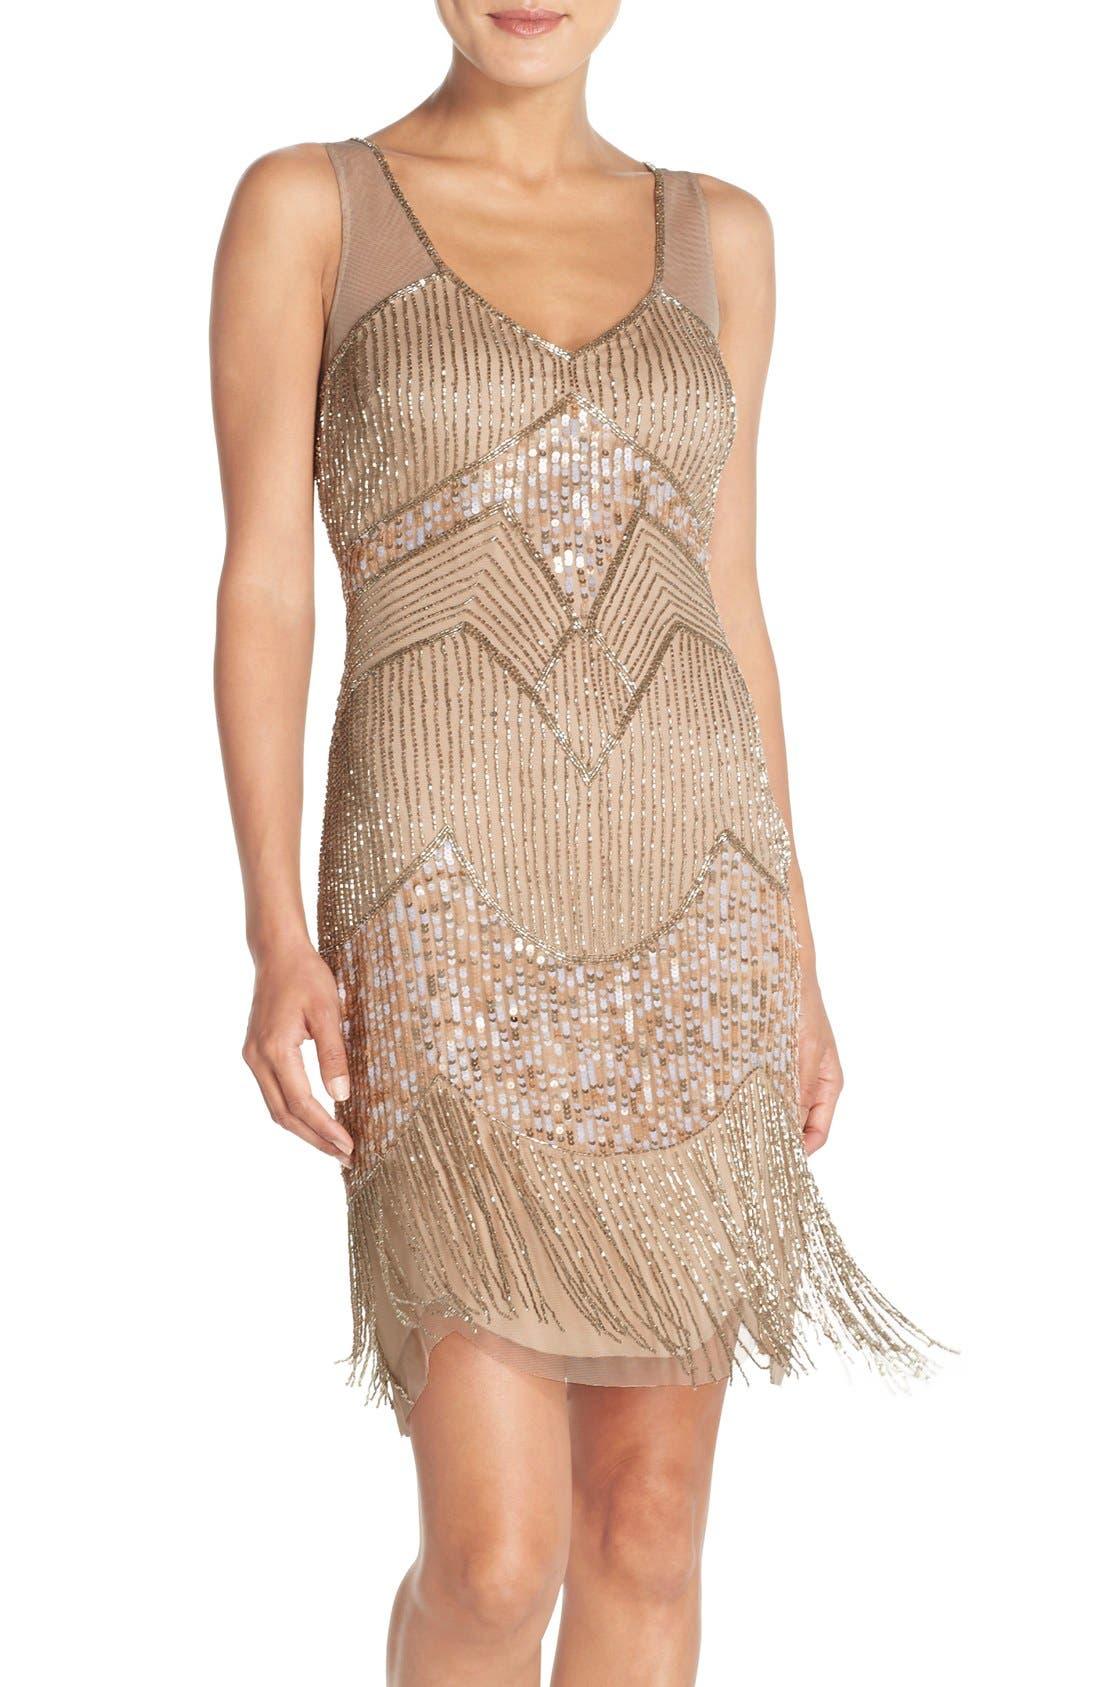 Alternate Image 1 Selected - Adrianna Papell Embellished Mesh Sheath Dress